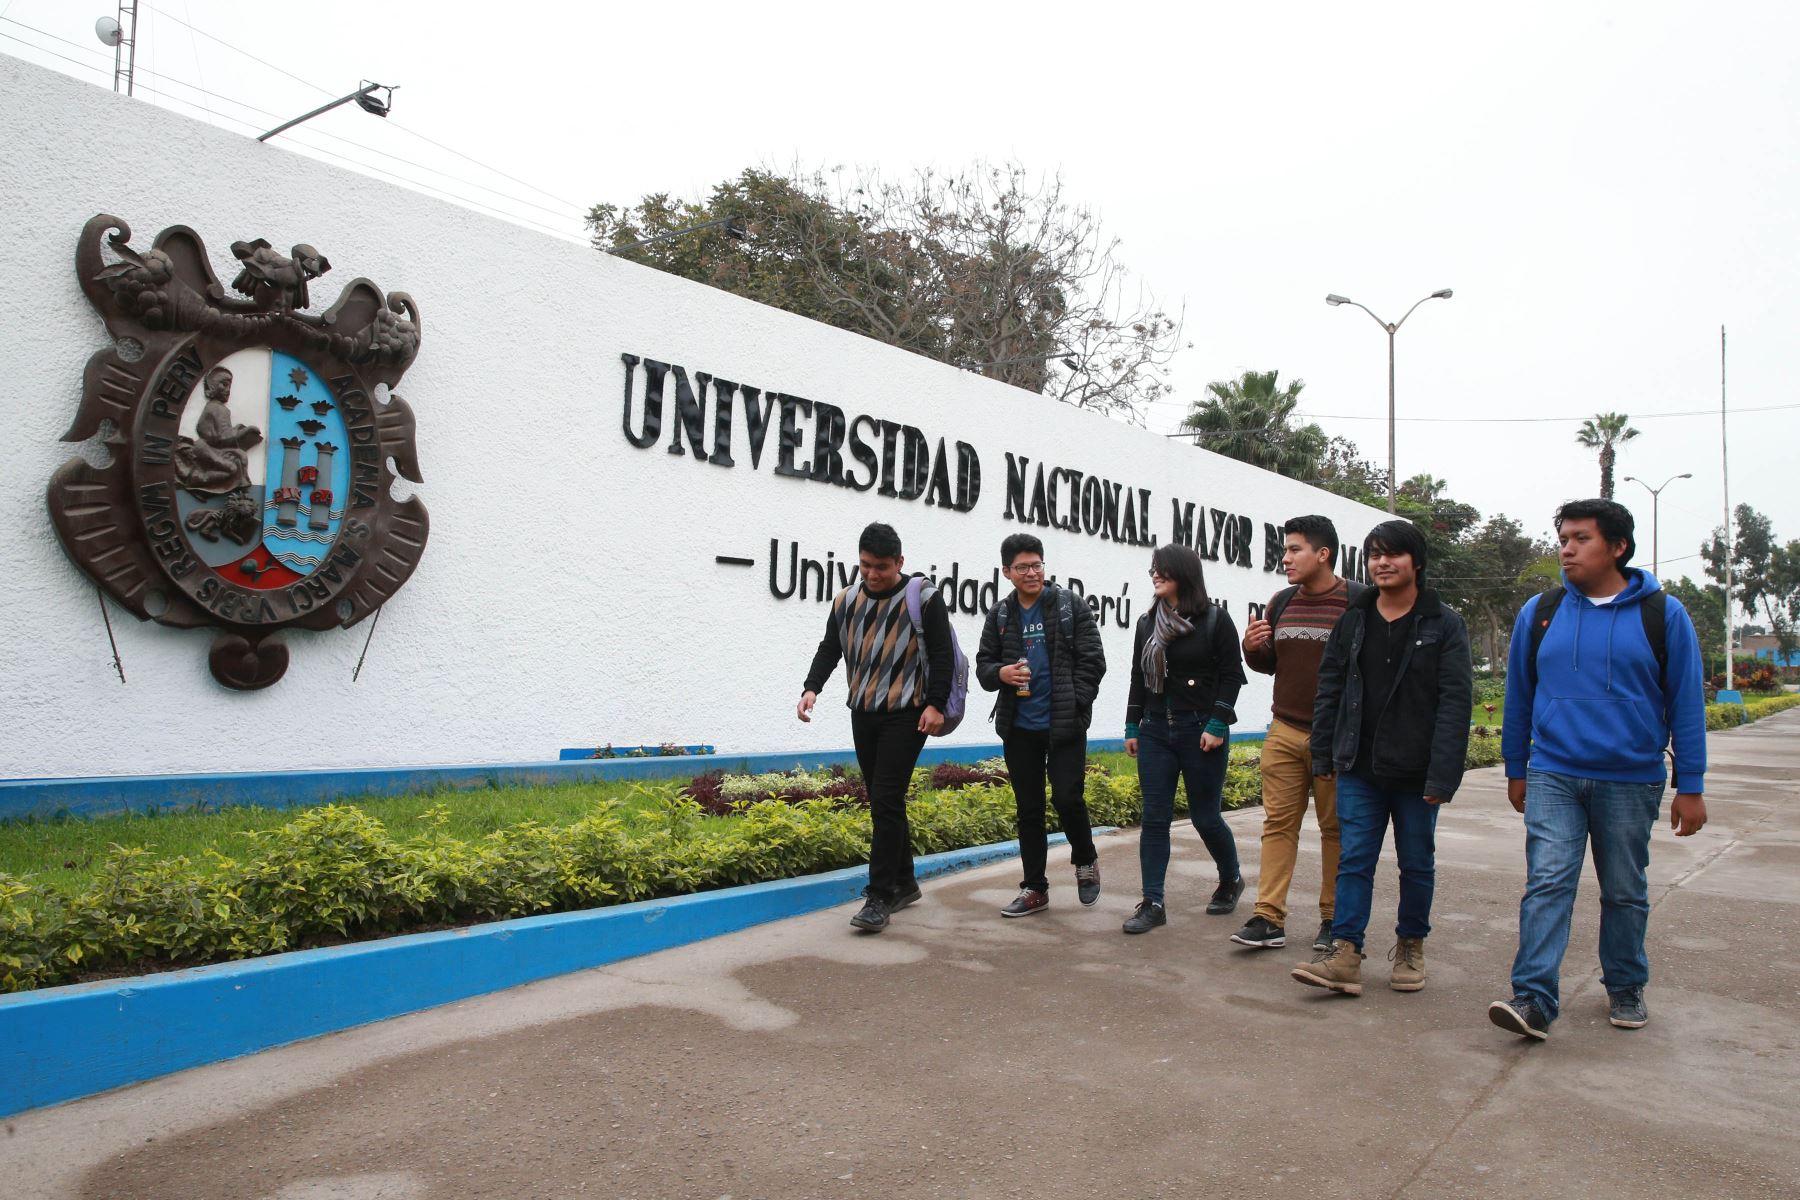 Pronabec ofrece Beca Permanencia para que estudiantes de universidades públicas no dejen de estudiar por falta de dinero. ANDINA/Vidal Tarqui